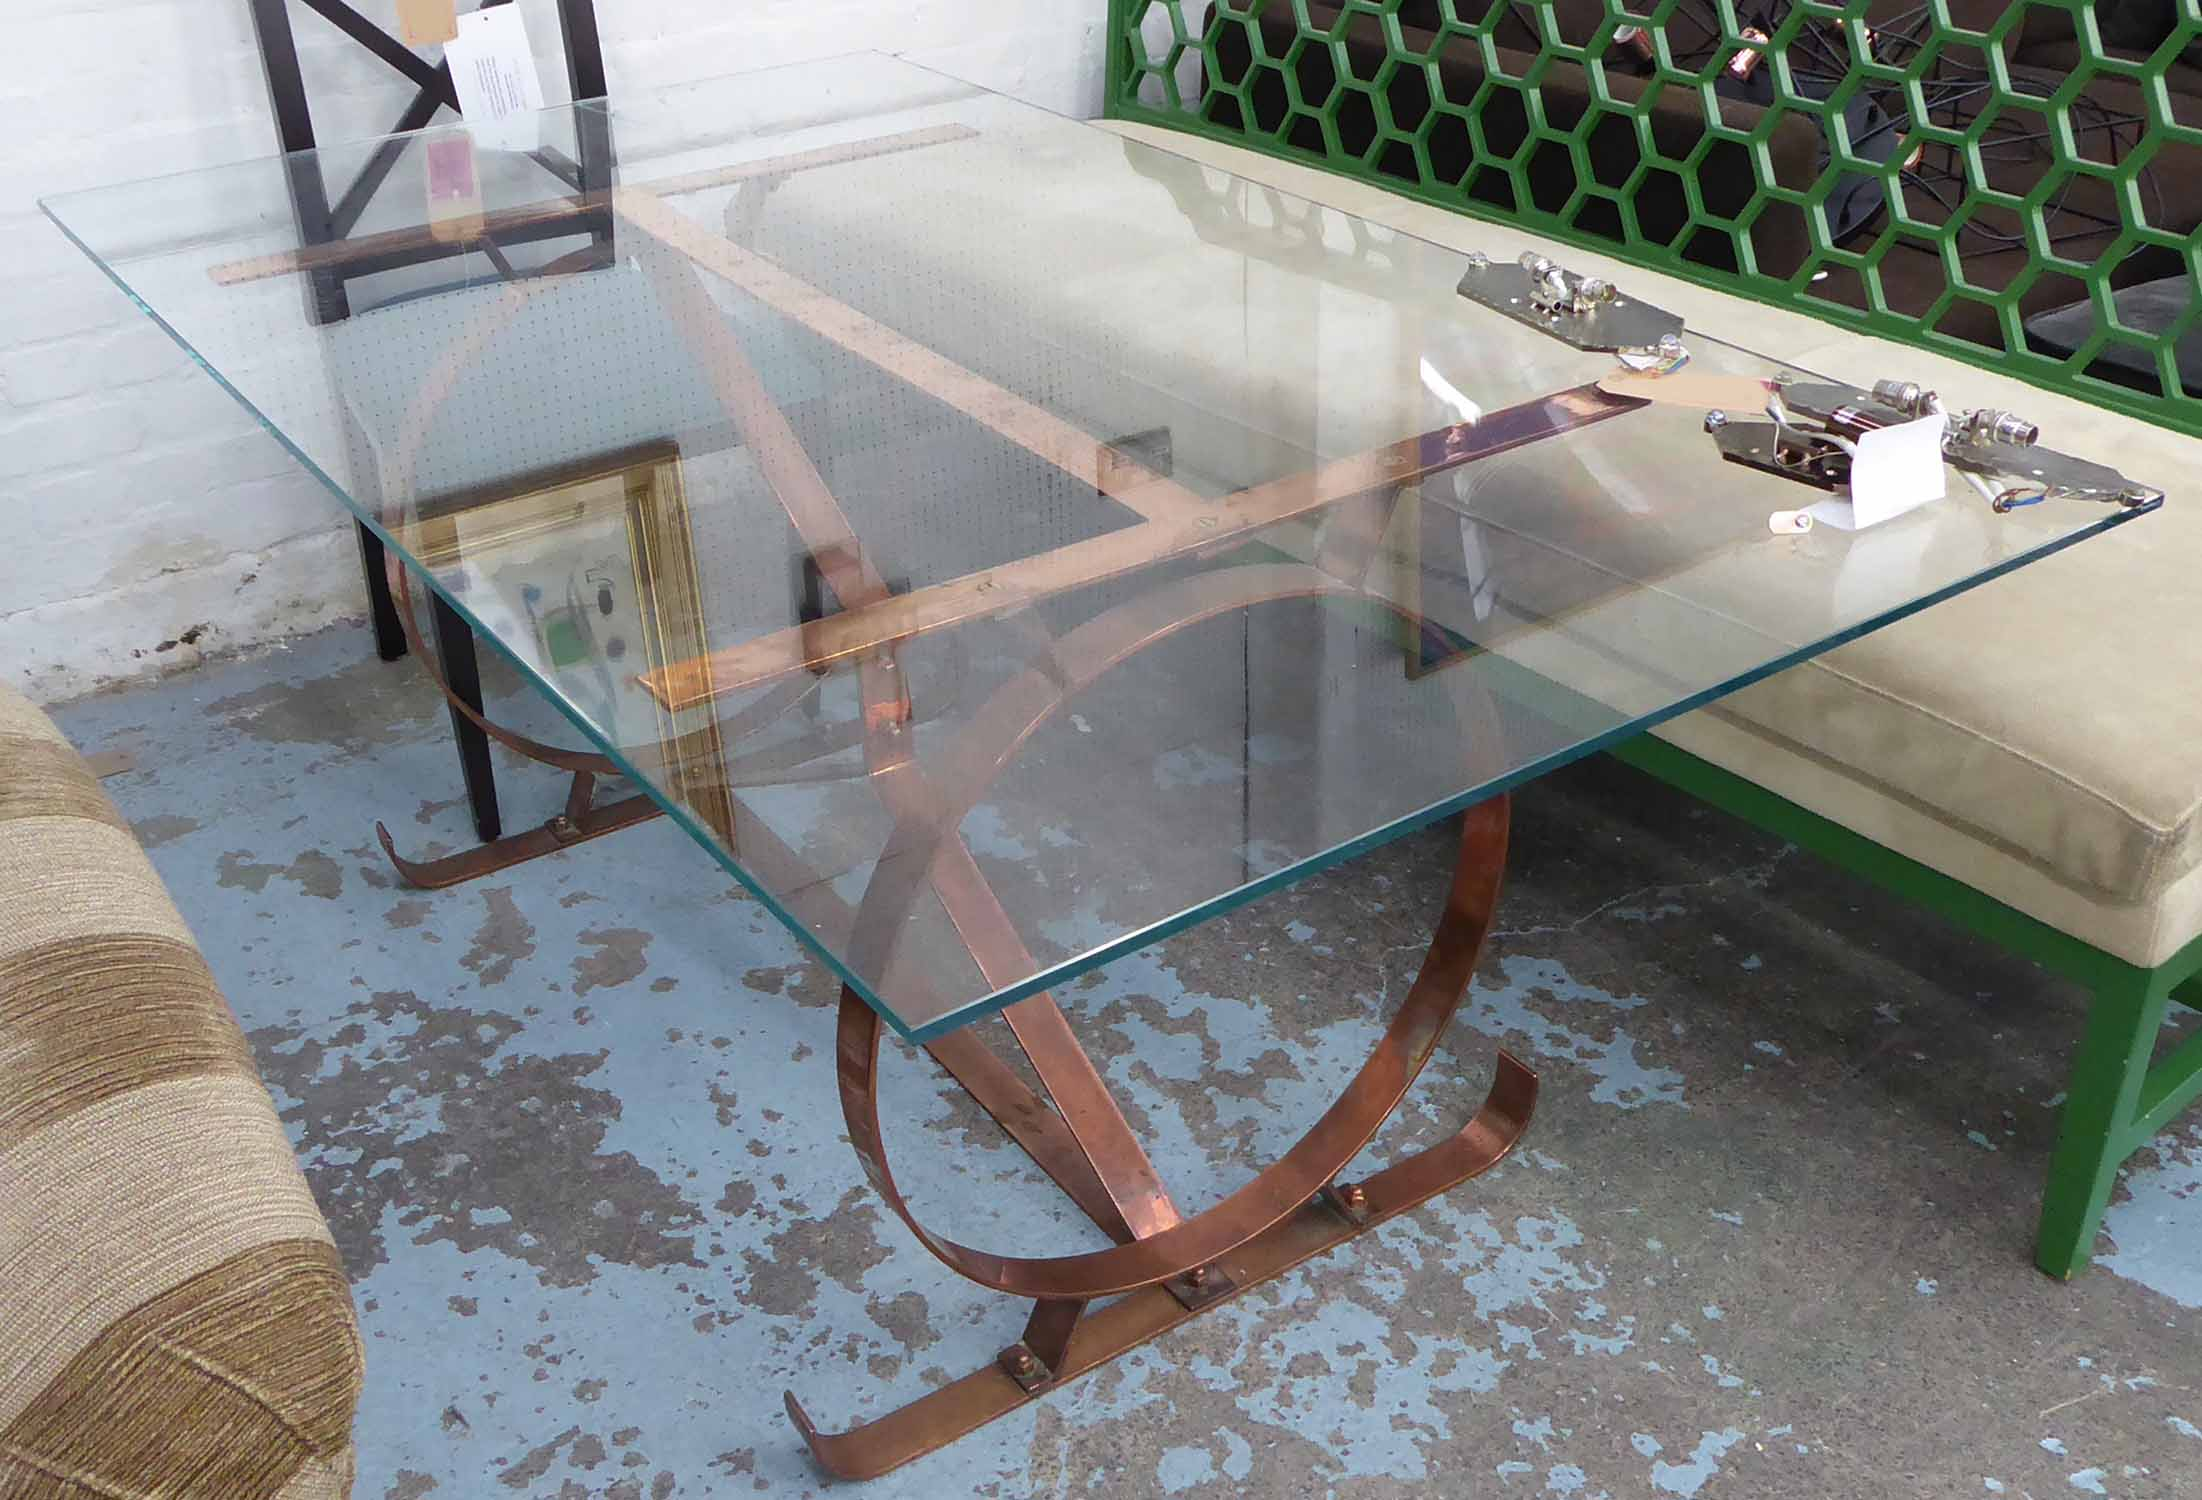 Lot 51 - DESK, vintage copper base with tempered glass top, 102cm x 78cm x 73cm.